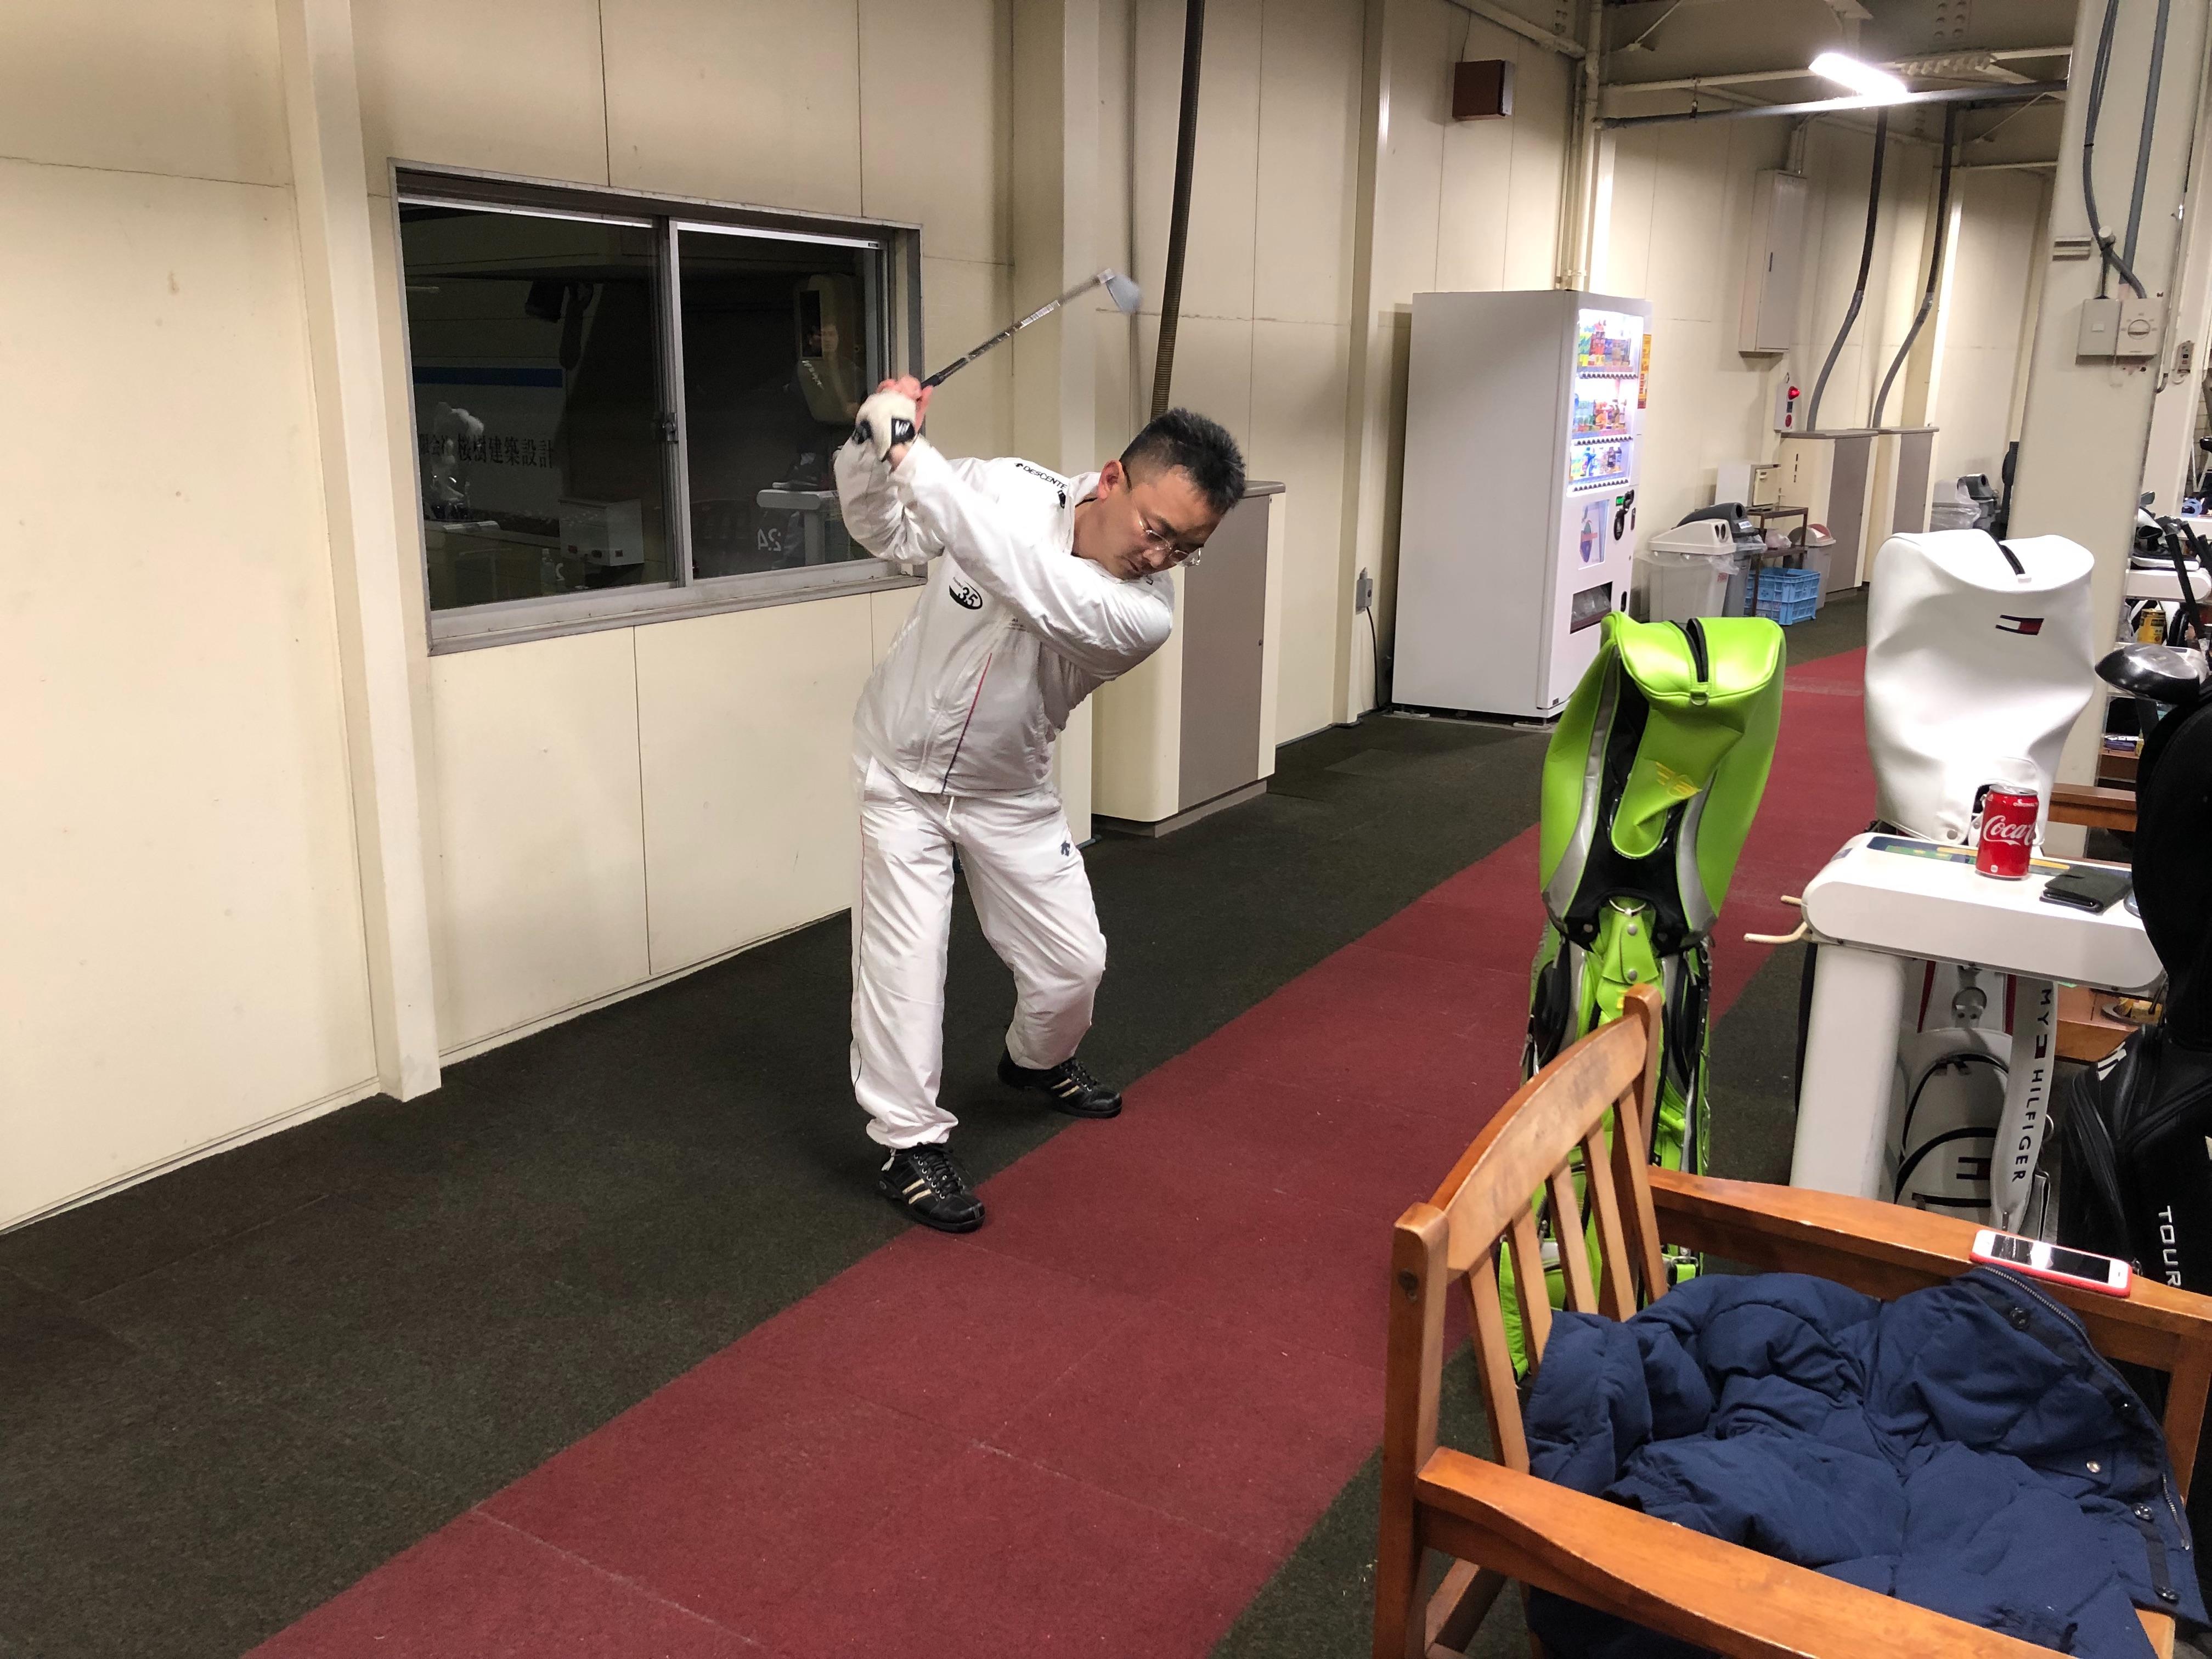 f:id:masanori-kato1972:20190325111610j:image